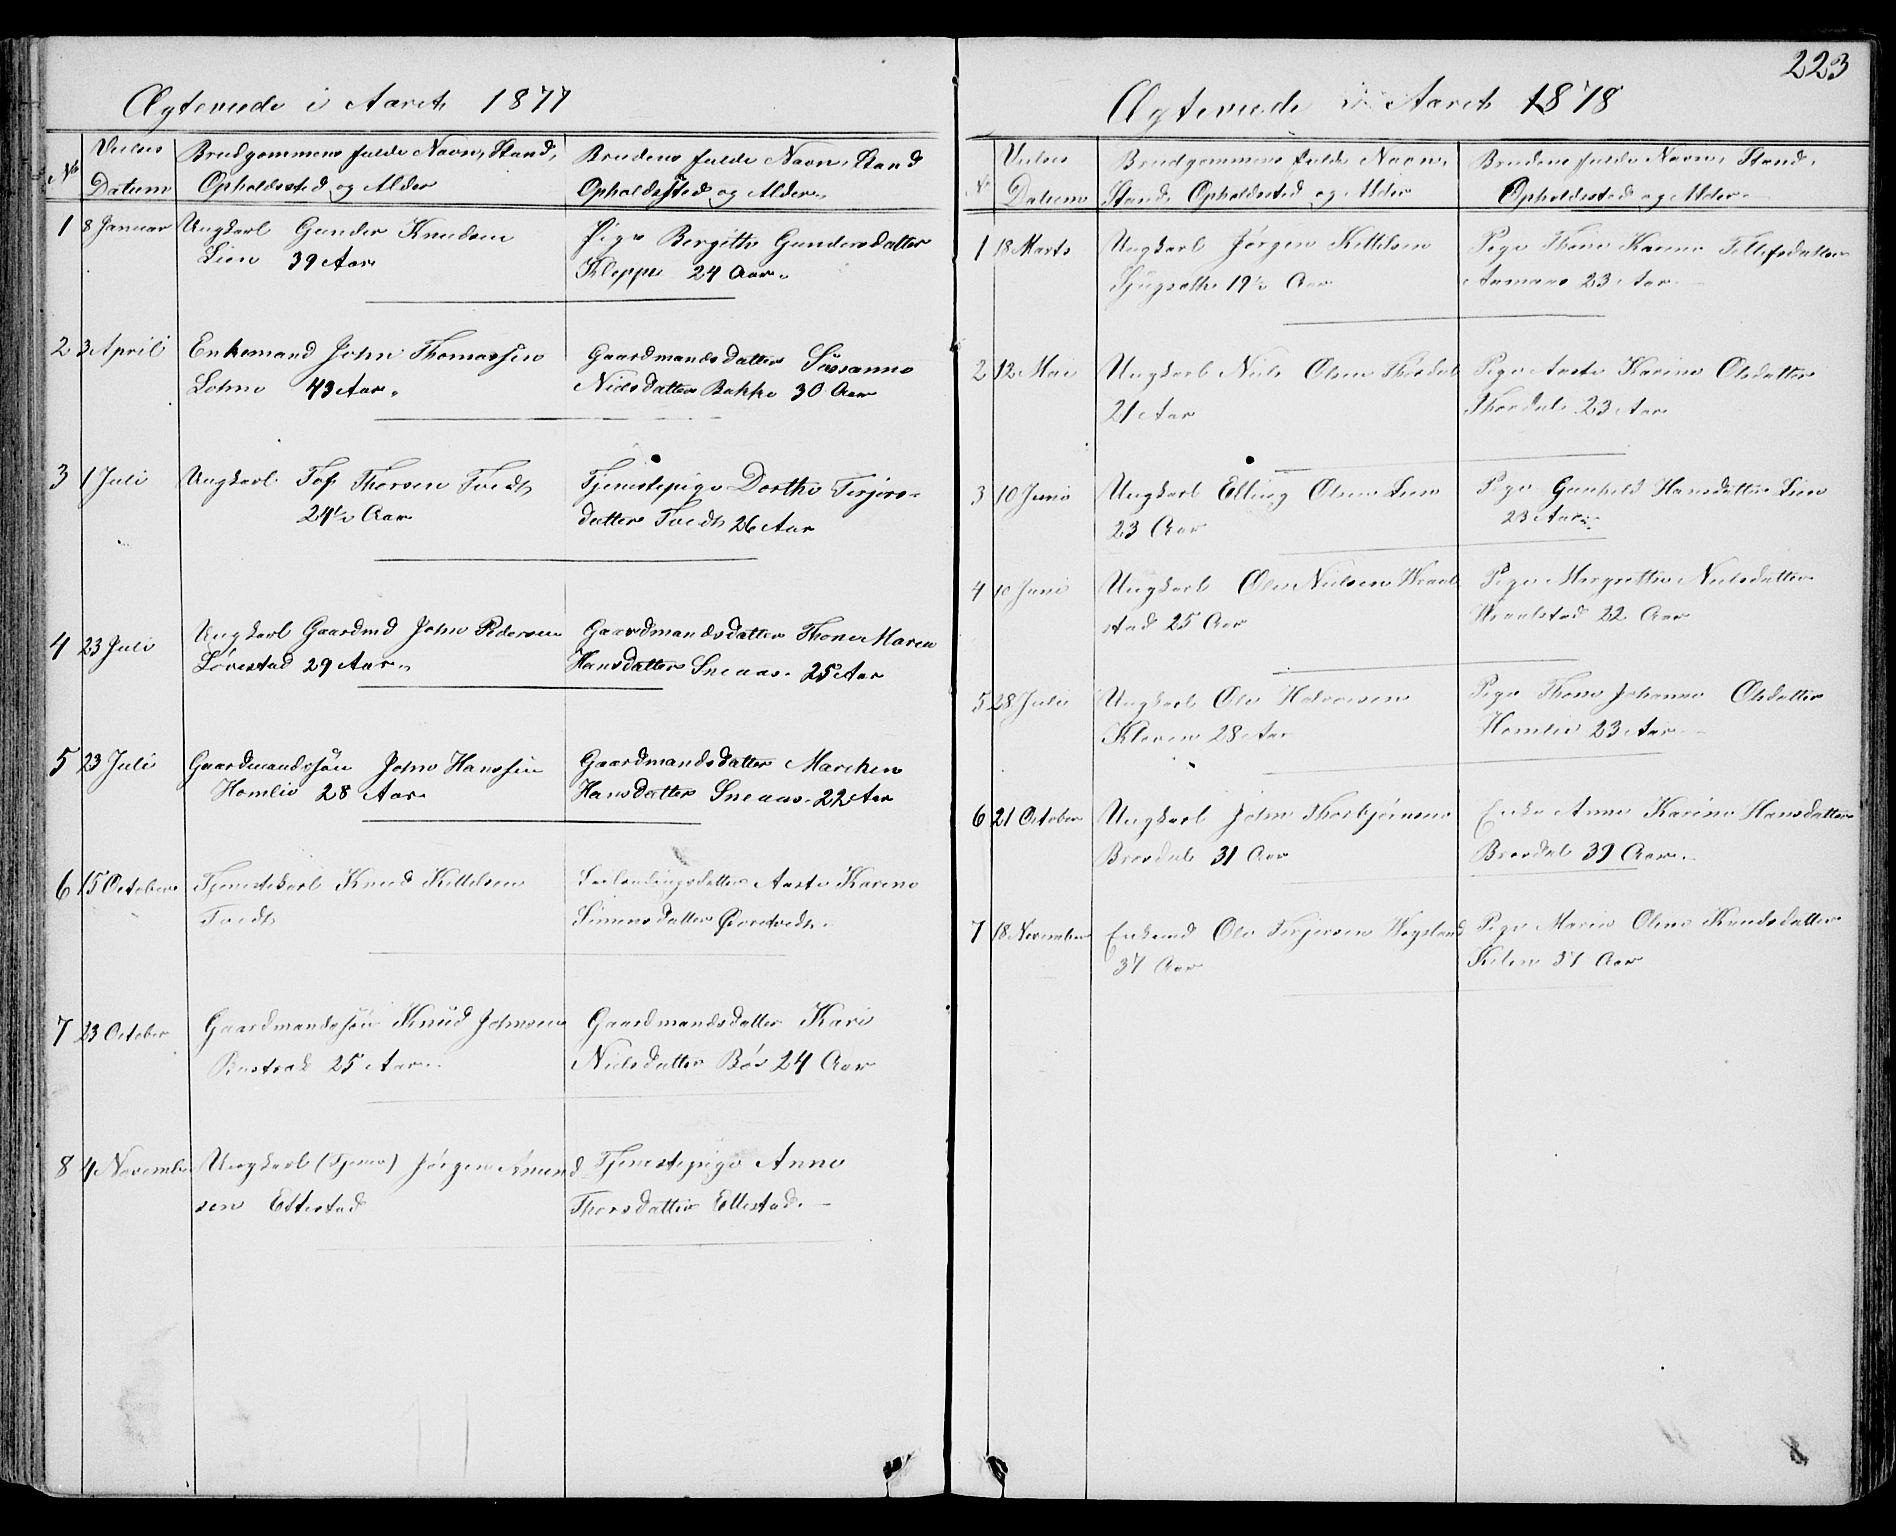 SAKO, Drangedal kirkebøker, G/Gb/L0001: Klokkerbok nr. II 1, 1856-1894, s. 223